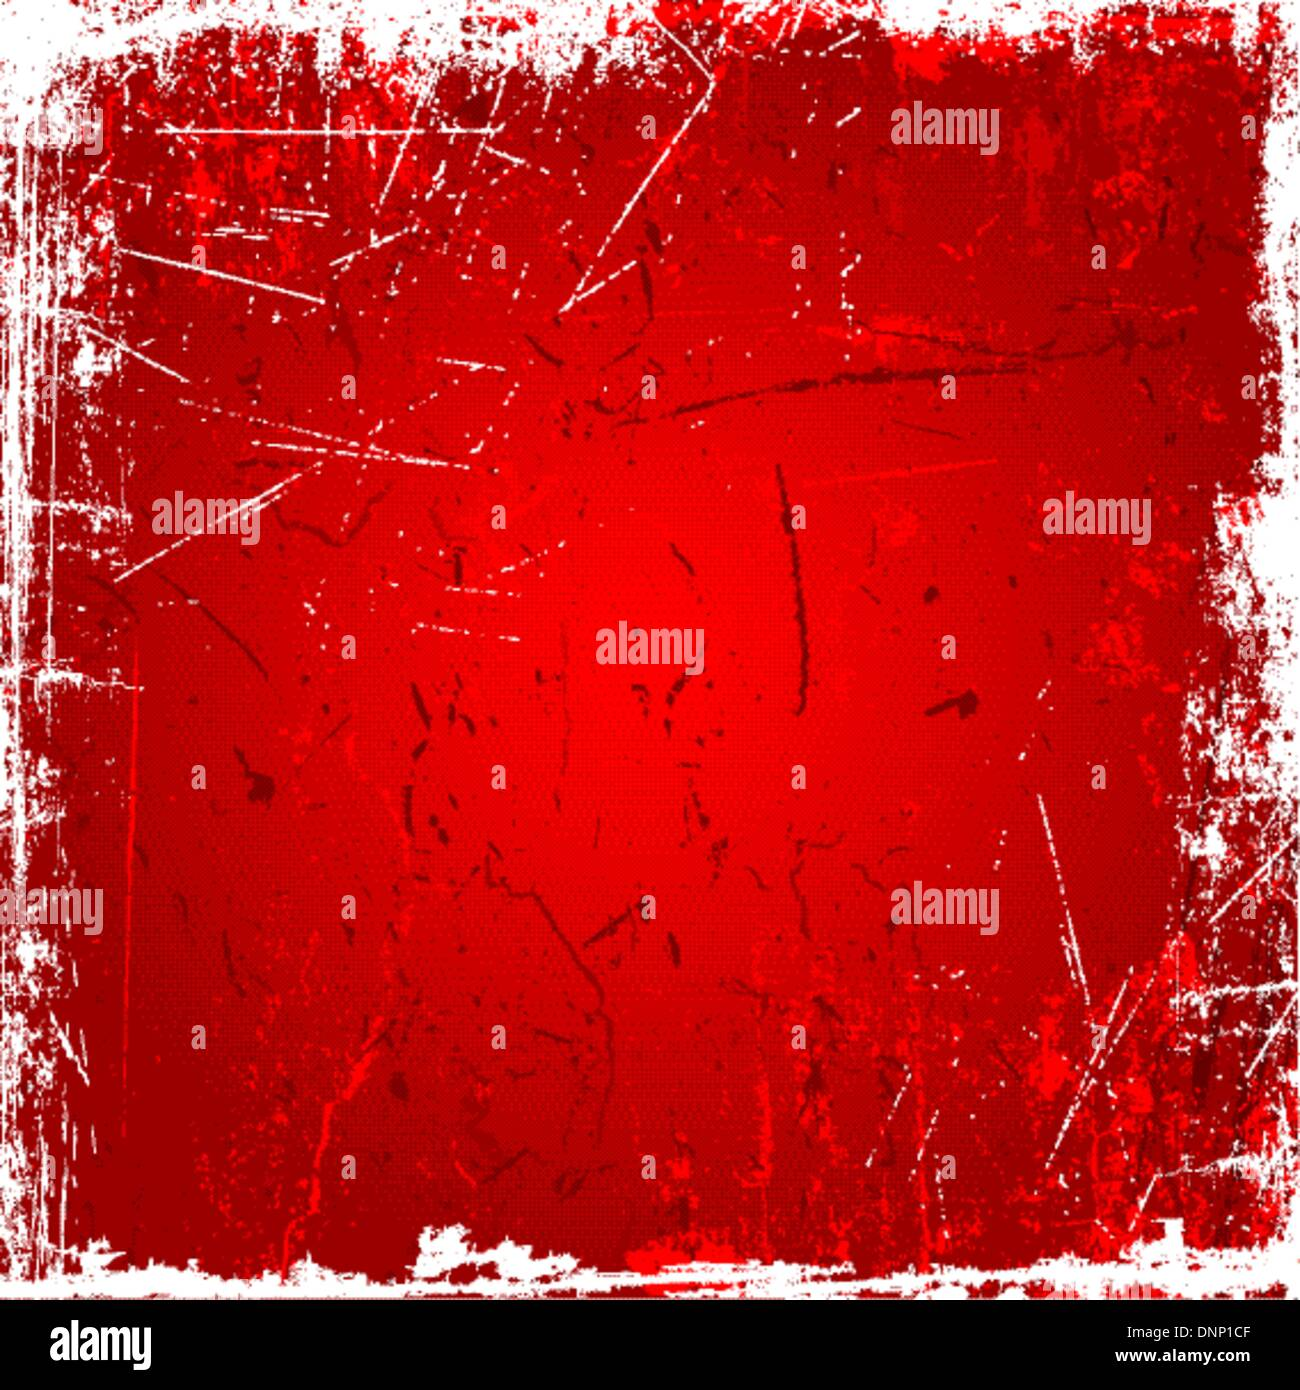 Antecedentes grunge con arañazos y manchas en tonos de rojo Imagen De Stock